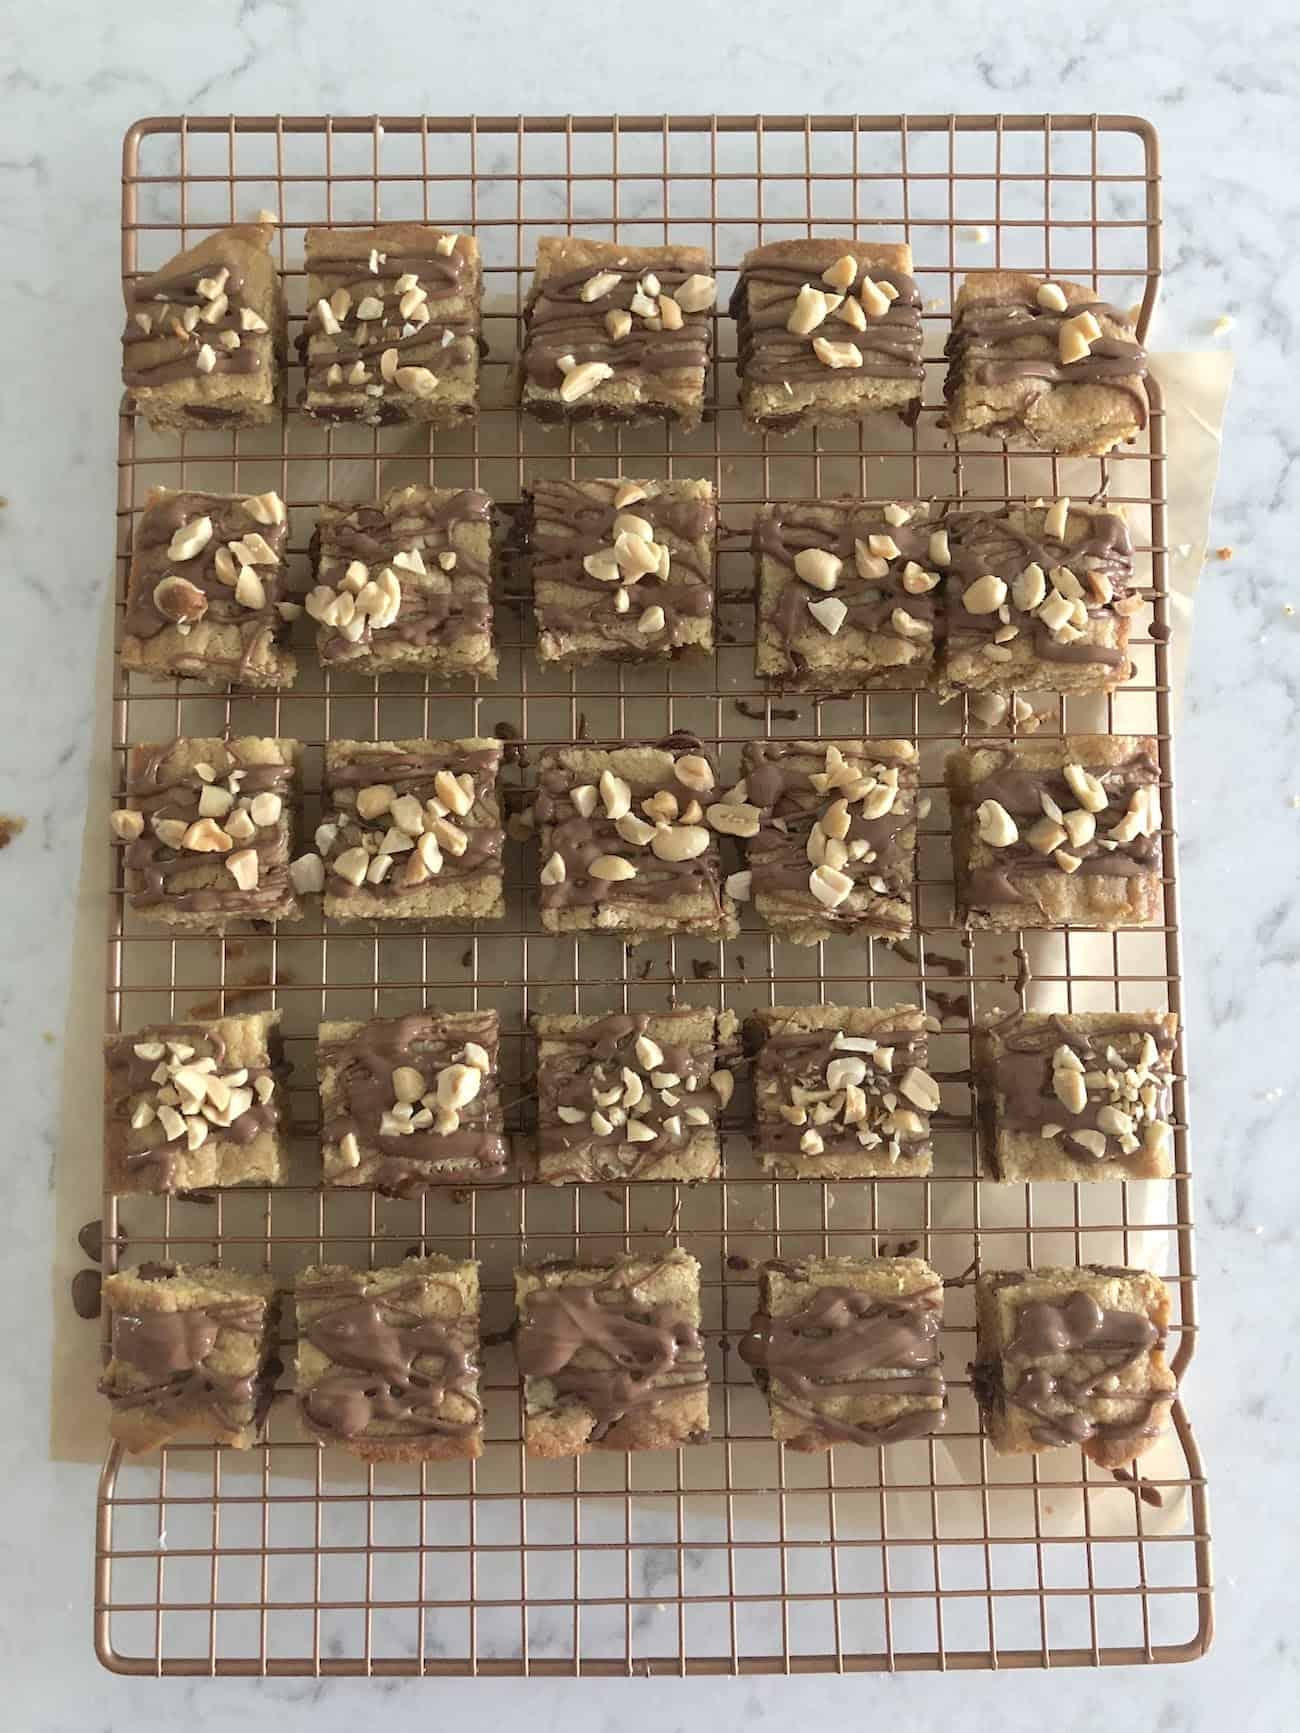 peanut butter milk chocolate chip blondies with peanuts